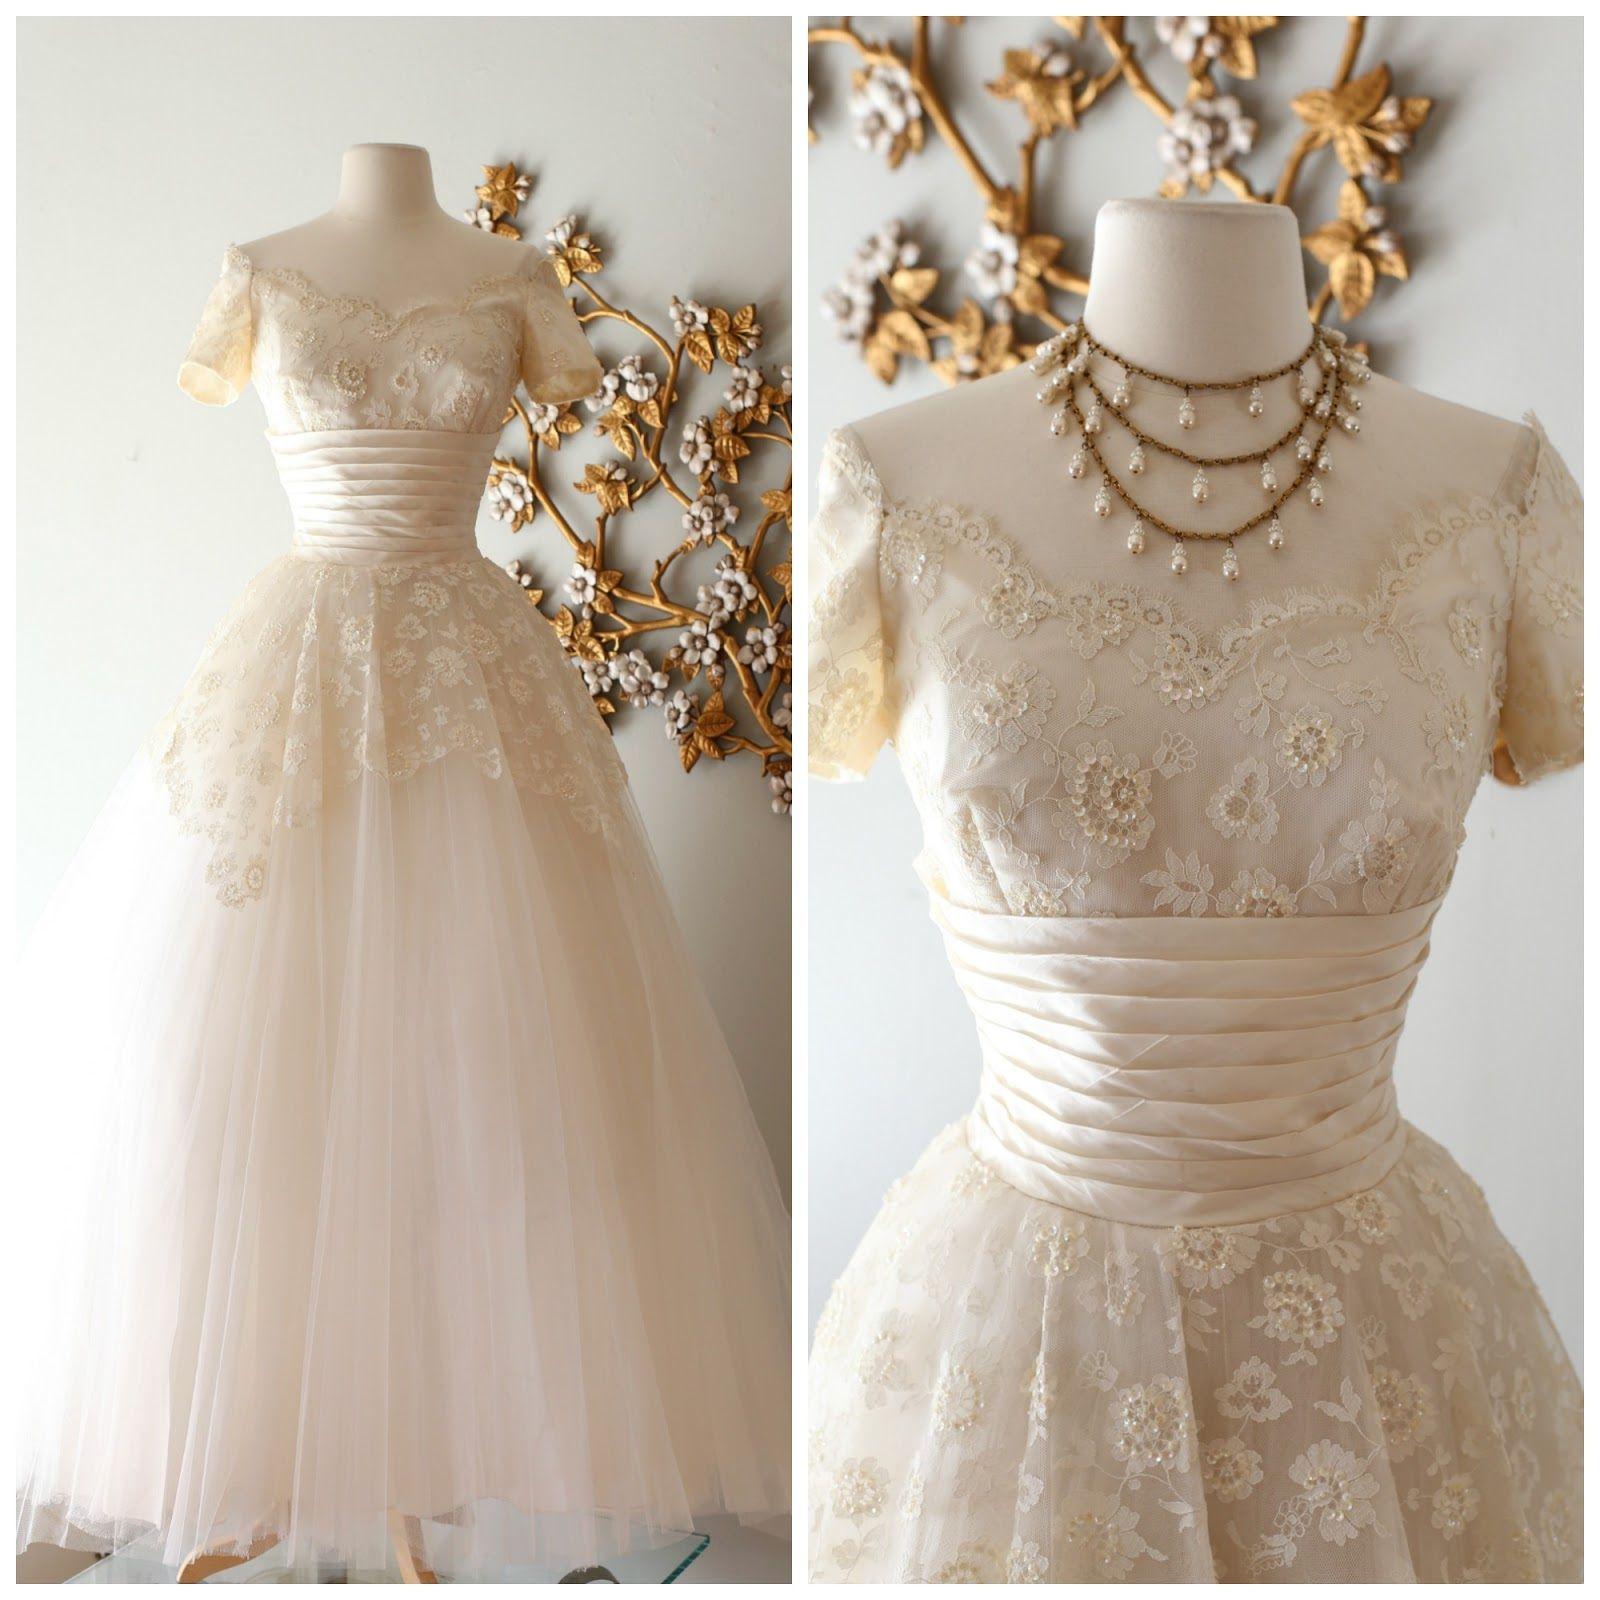 55+ Portland oregon Wedding Dress Shops - Wedding Dresses for Fall ...